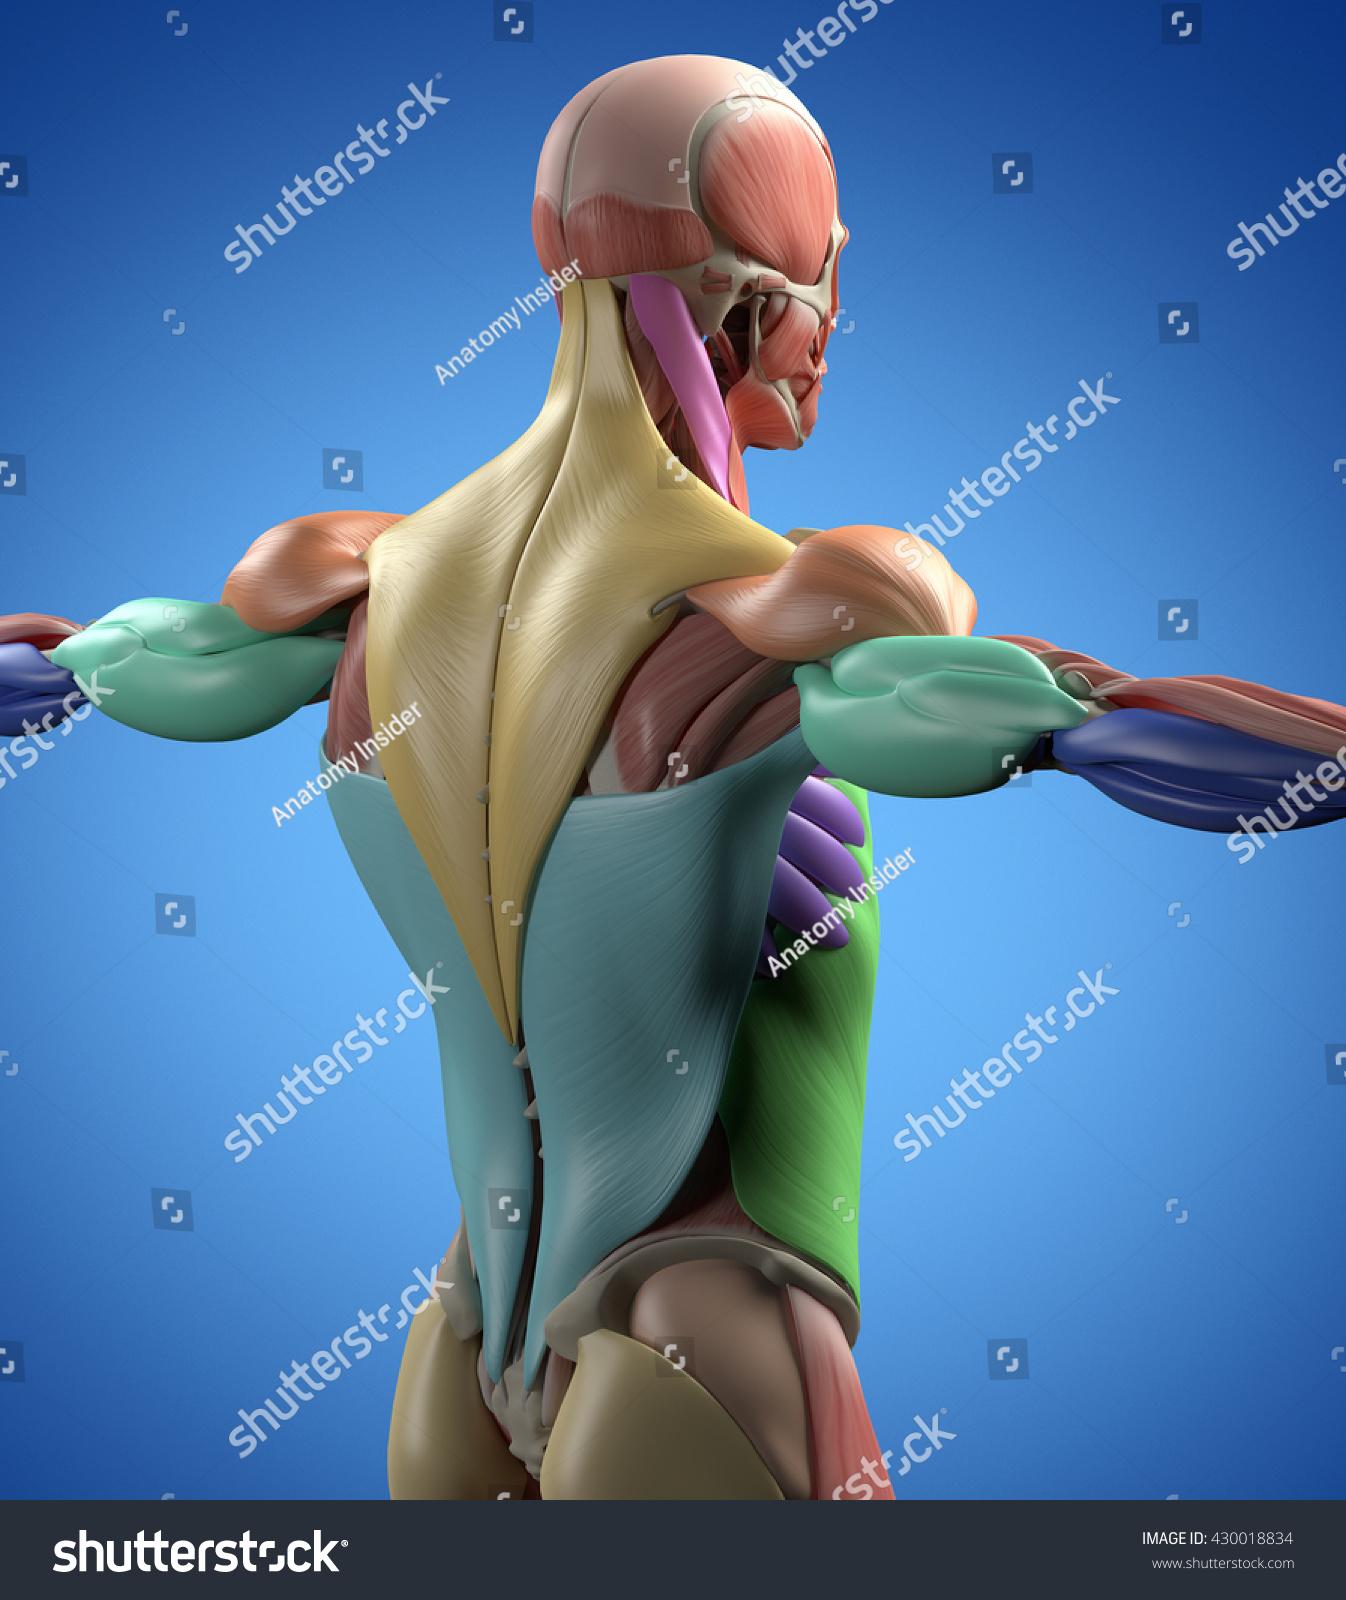 Human Anatomy Muscle Groups Muscle Layout Stock Illustration